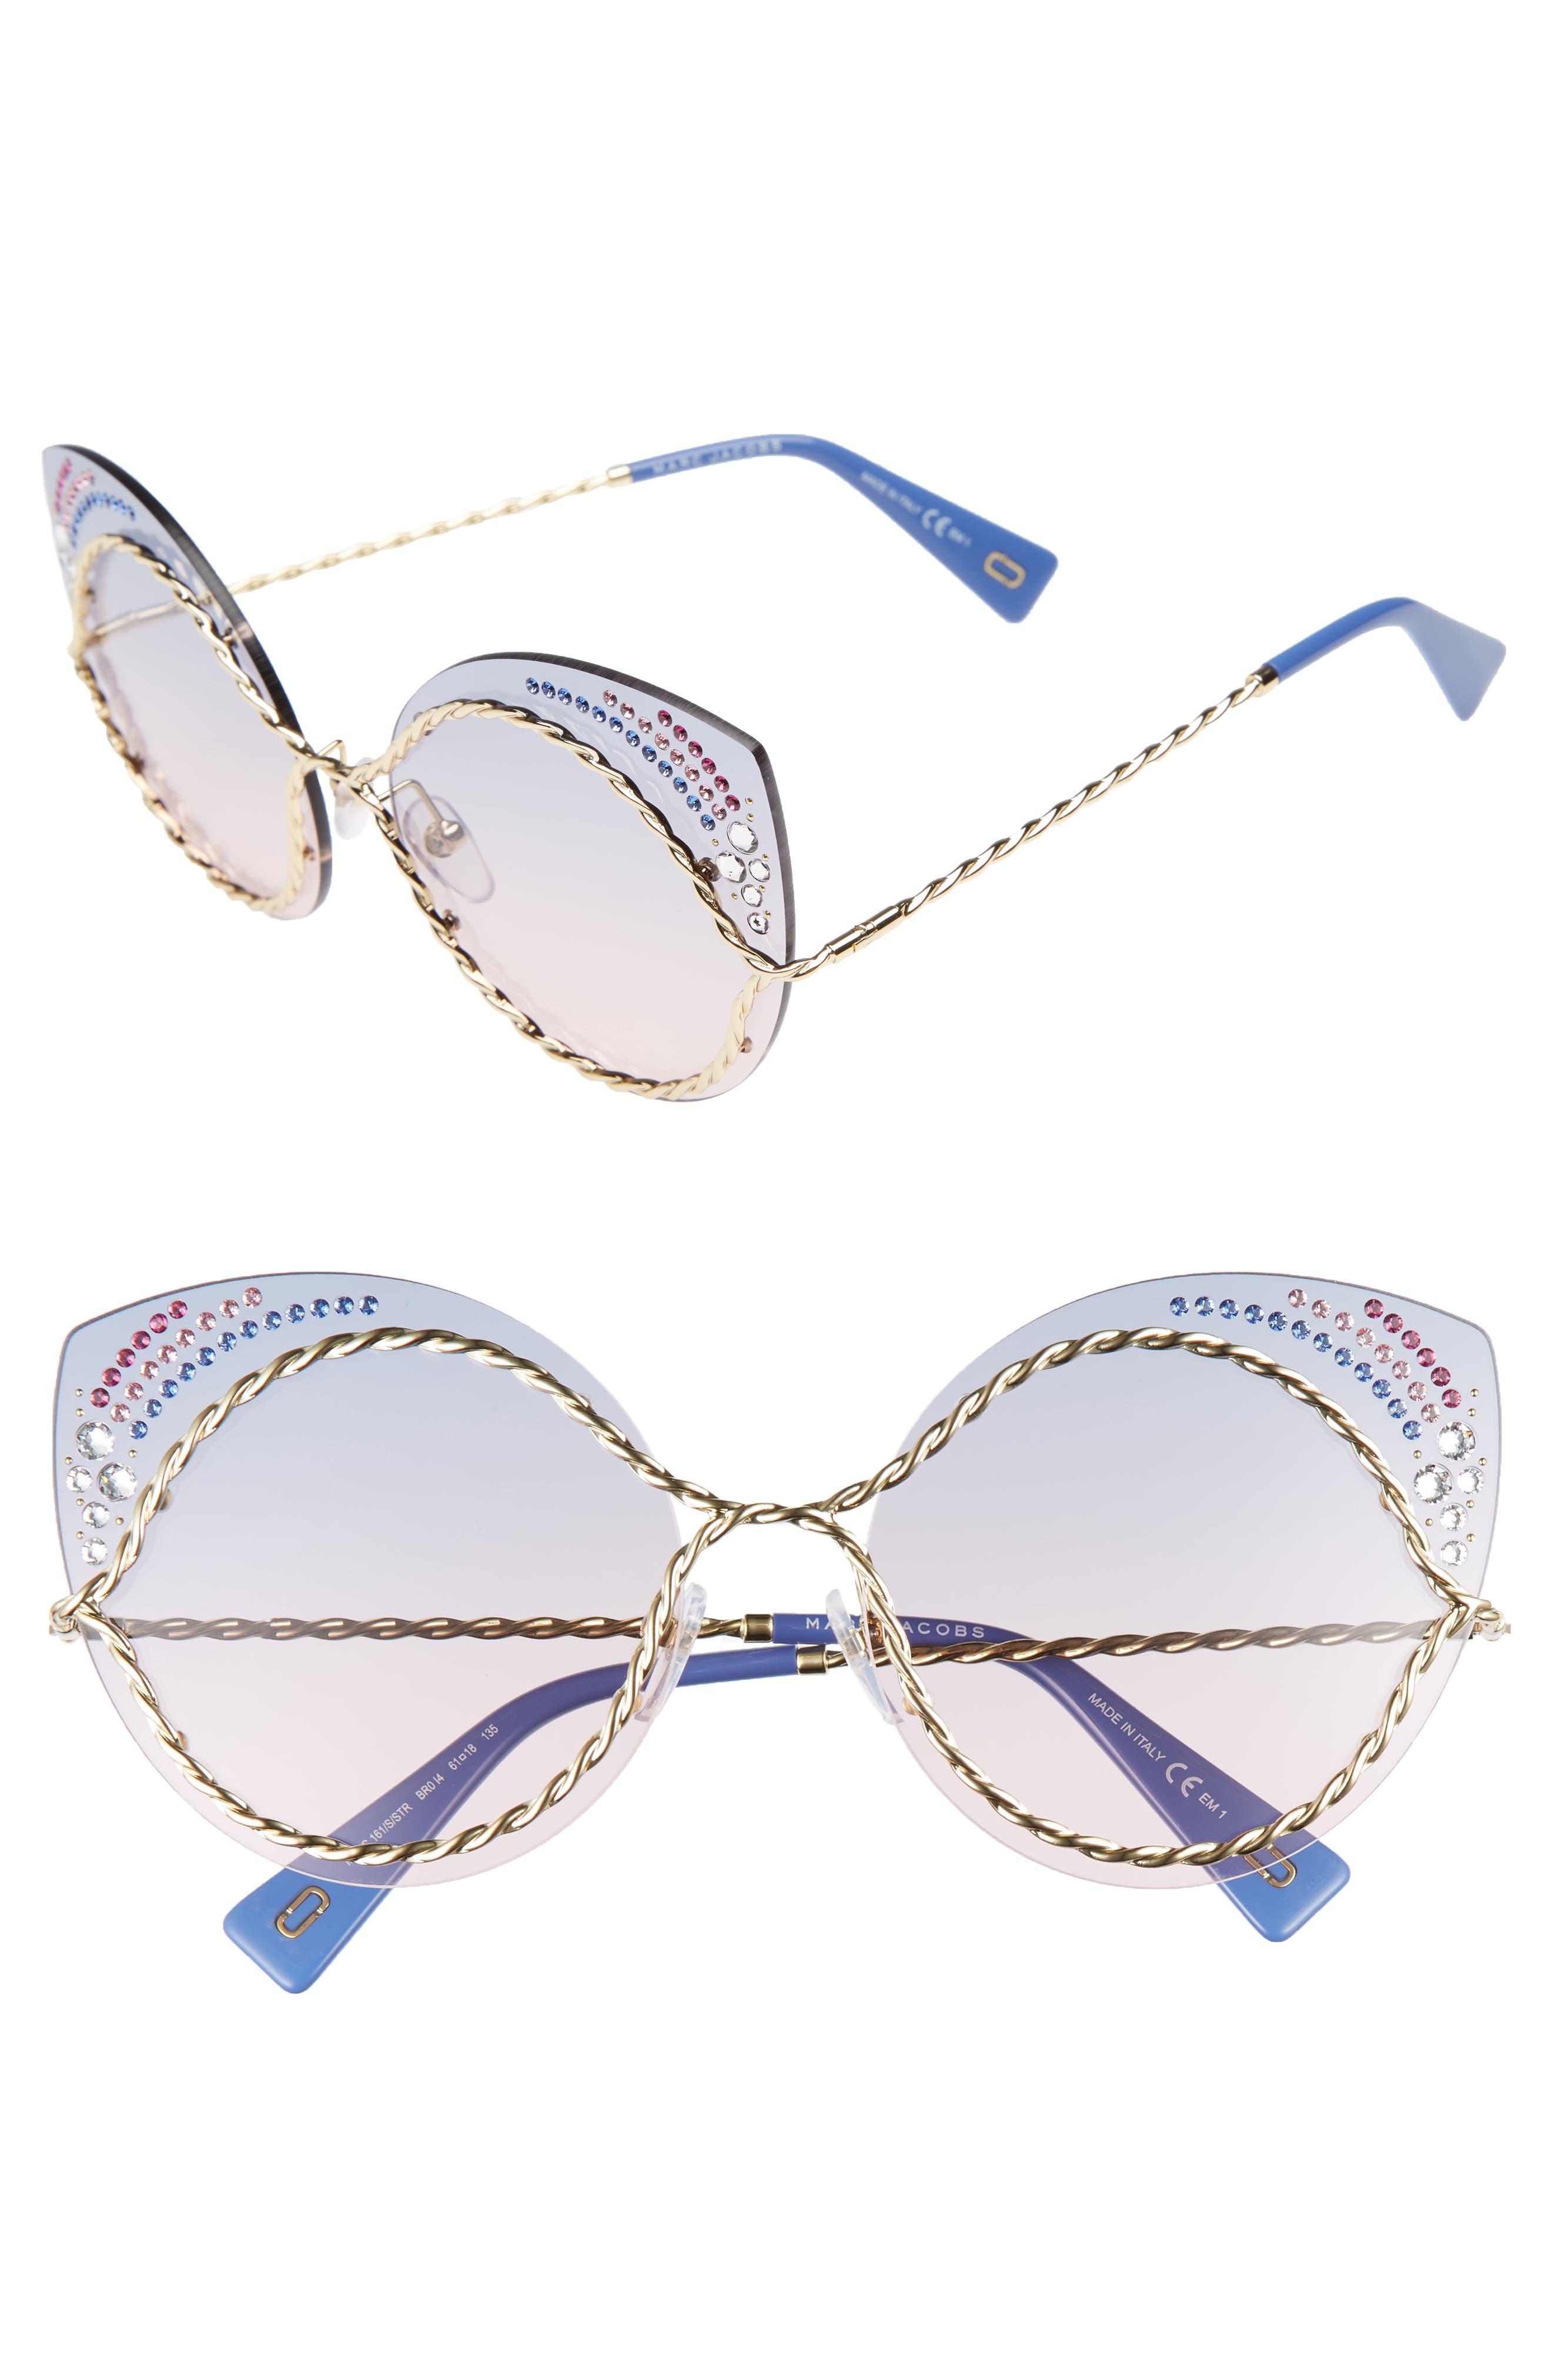 61mm Rimless Gradient Cat Eye Sunglasses,                         Main,                         color, Blue/ Pink